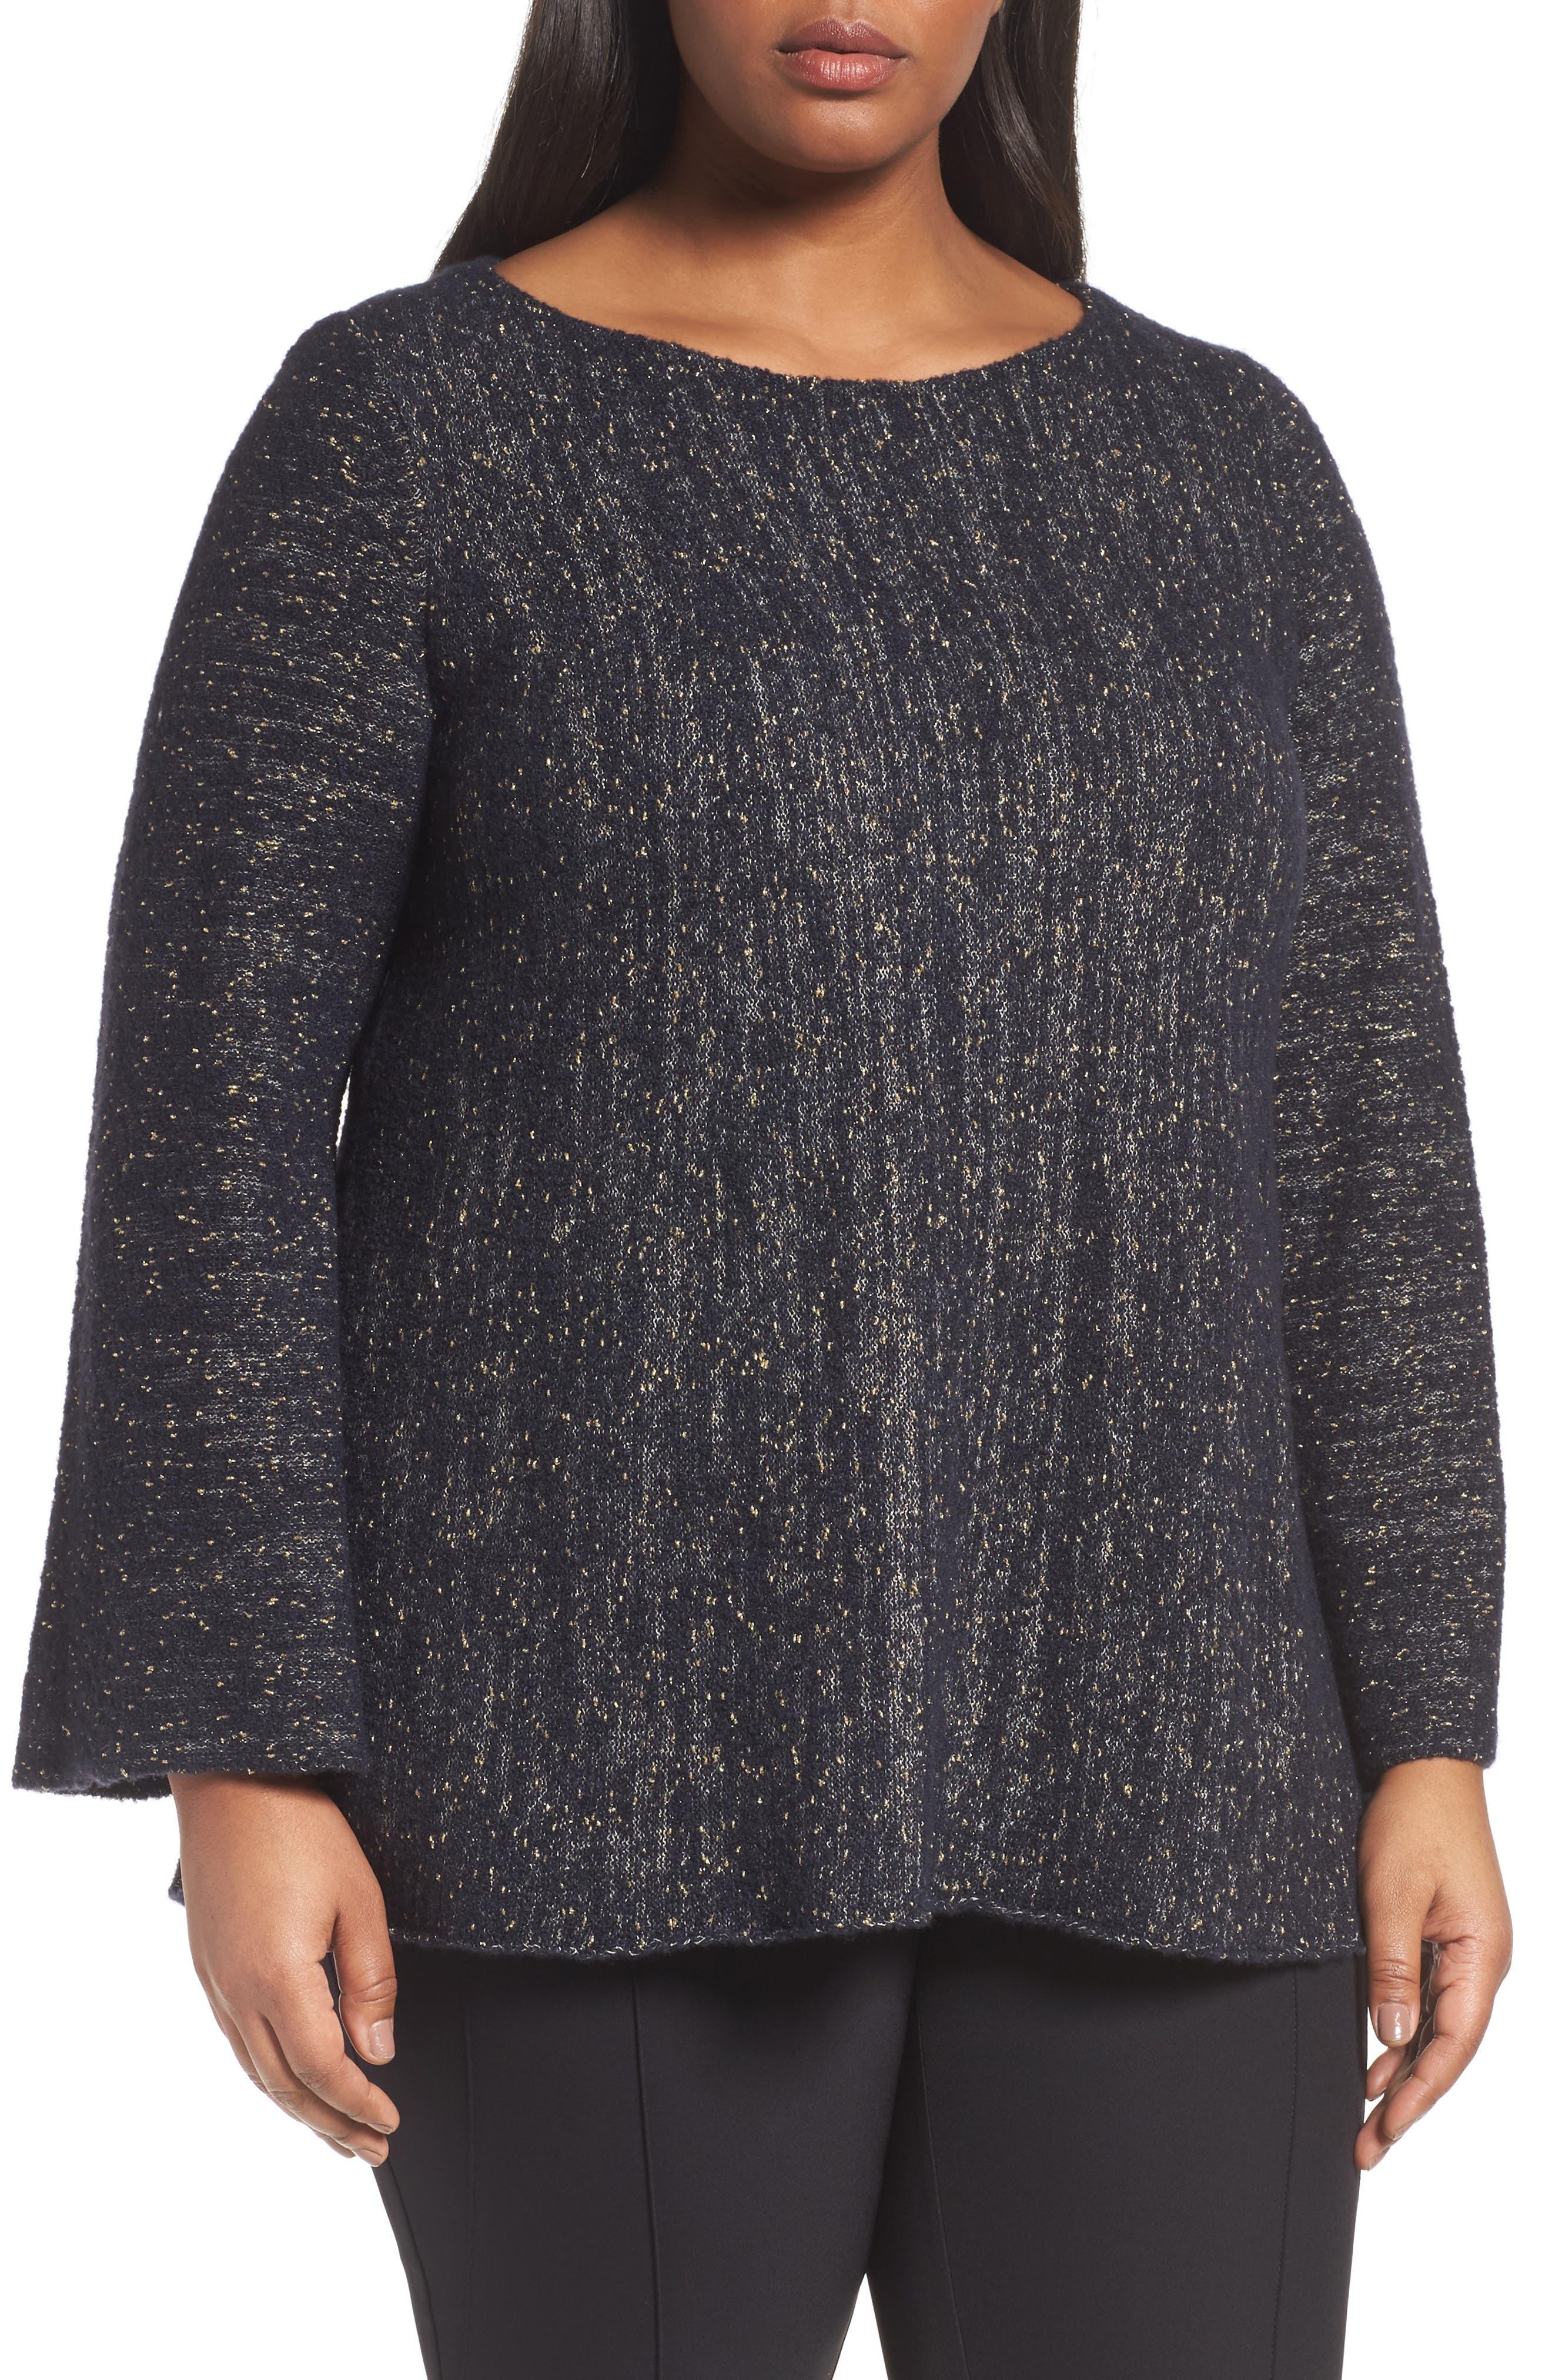 Lafayette 148 Metallic Knit A-Line Sweater,                         Main,                         color, Ink Metallic